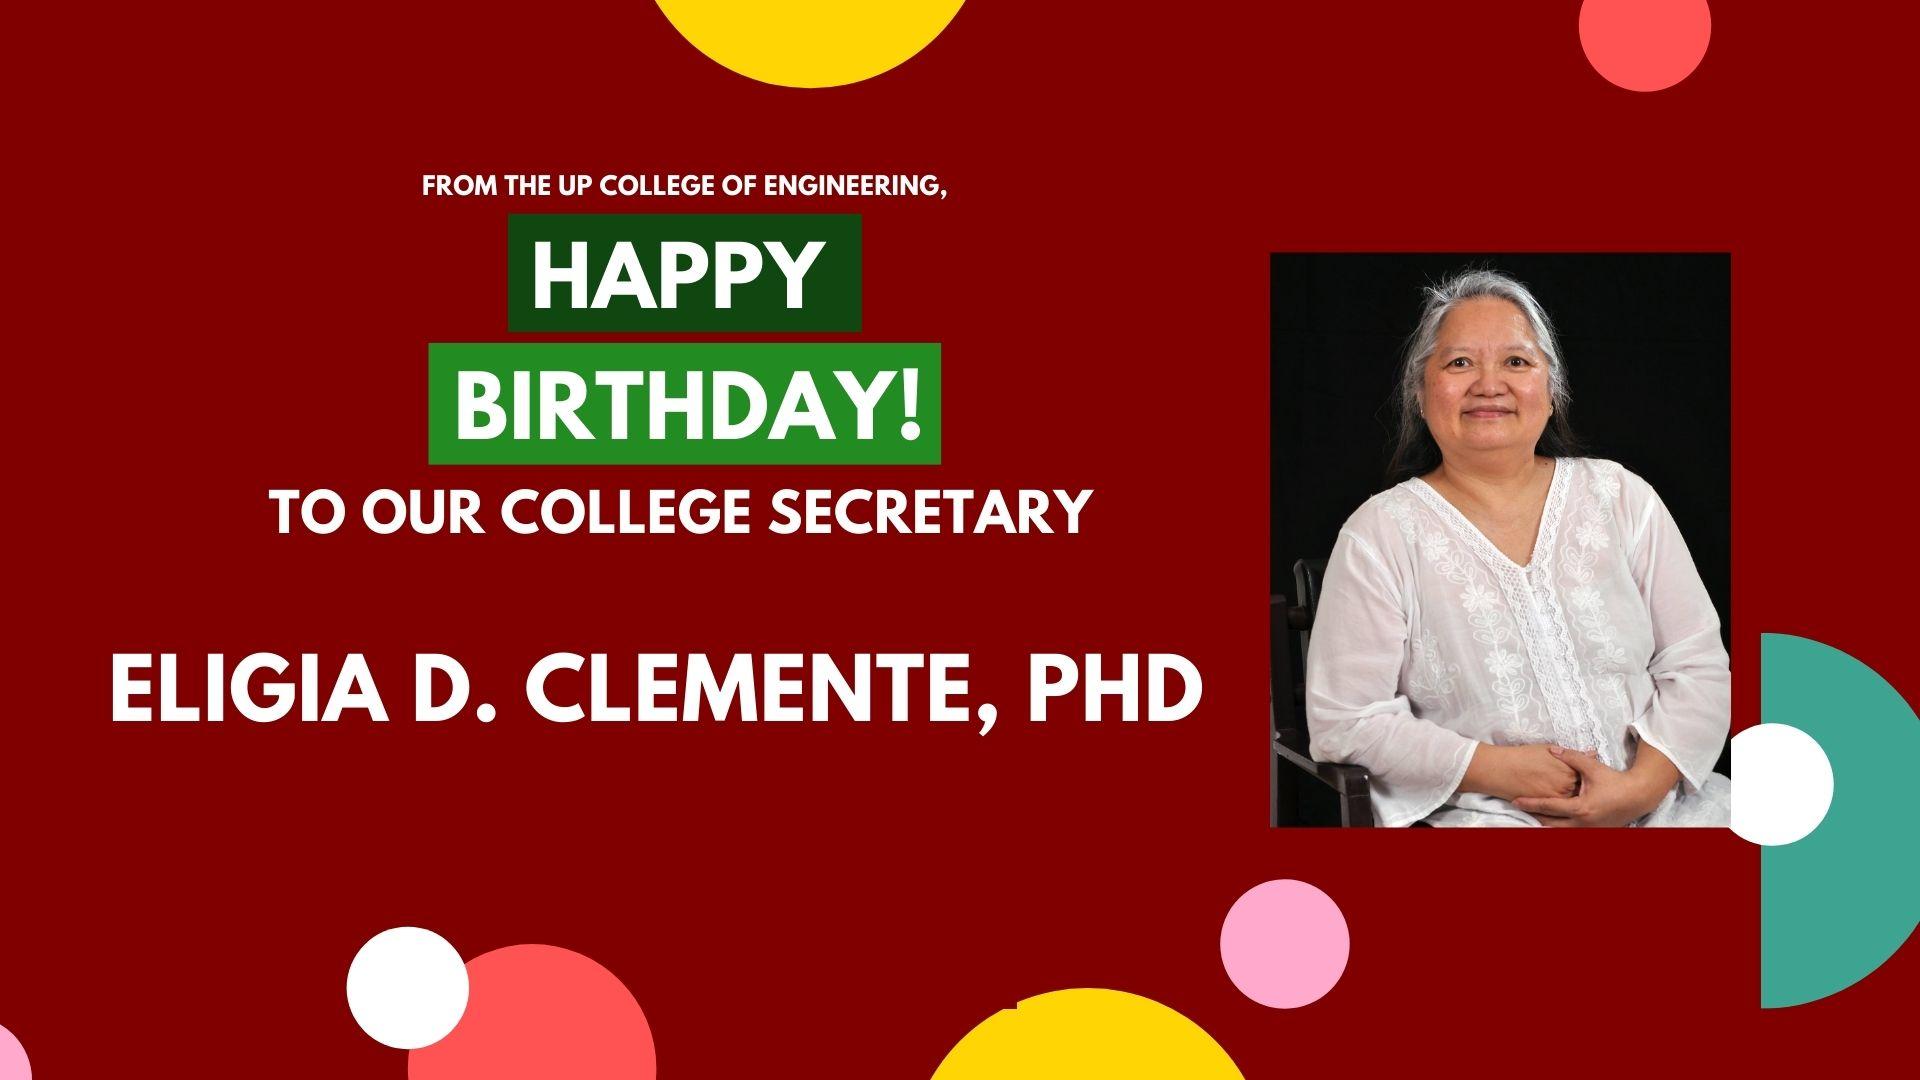 Birthday Greetings to the UP CoE College Secretary!